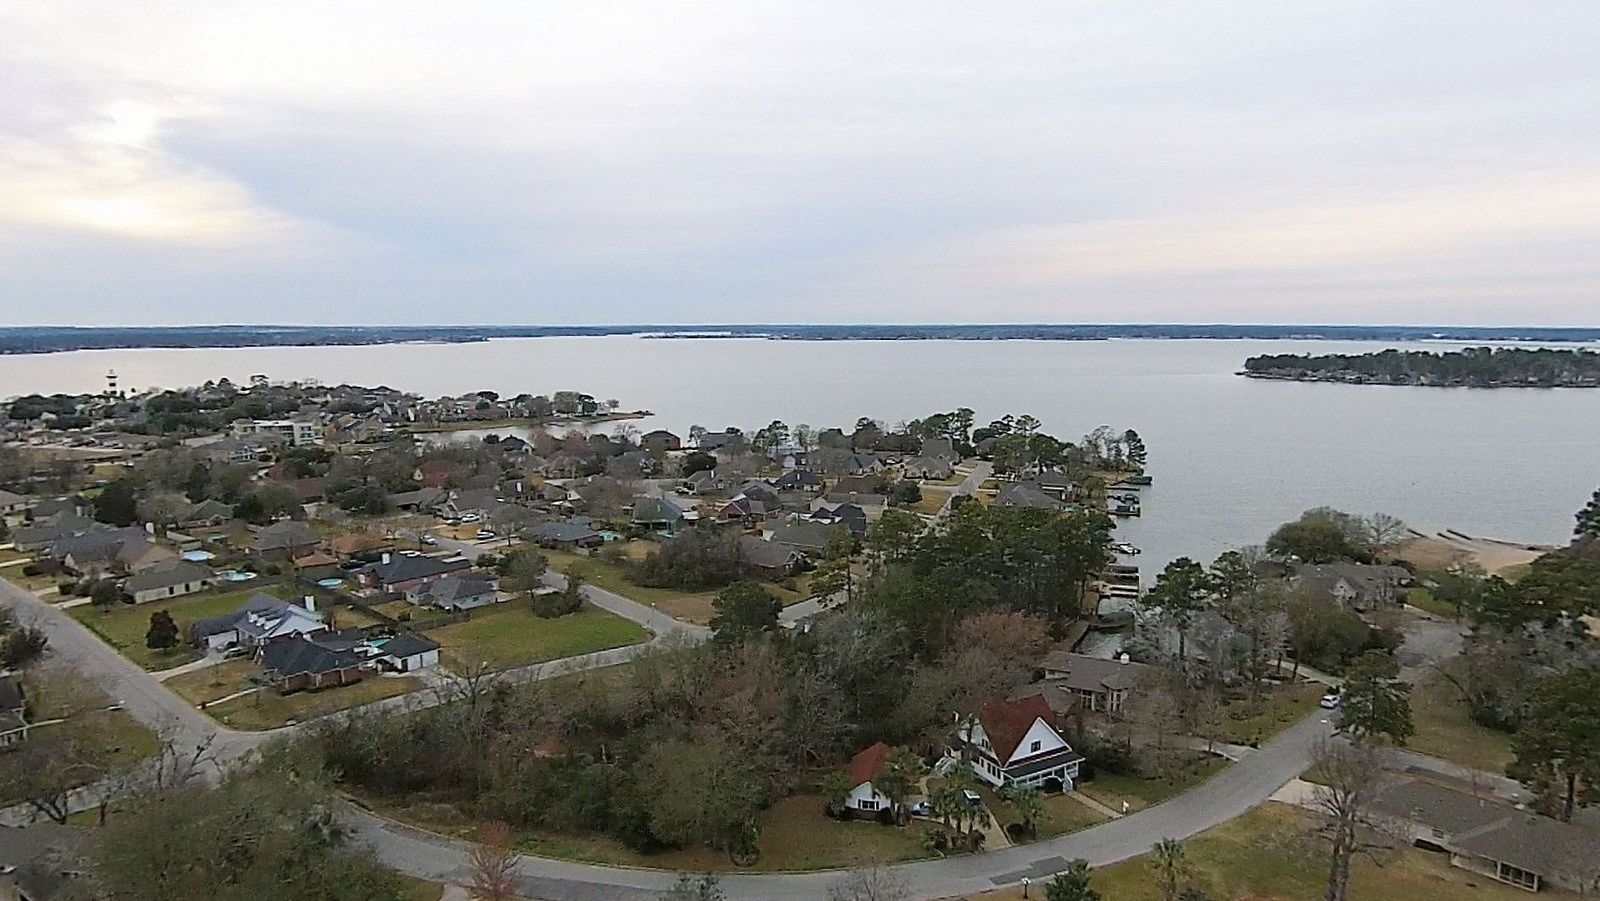 5239 Lakeshore Dr _ Seven Coves _ lake Conroe _ Lakefront Community _ Willis _ TX _ www.TravisRE.com . (17) | Flickr - Photo Sharing!